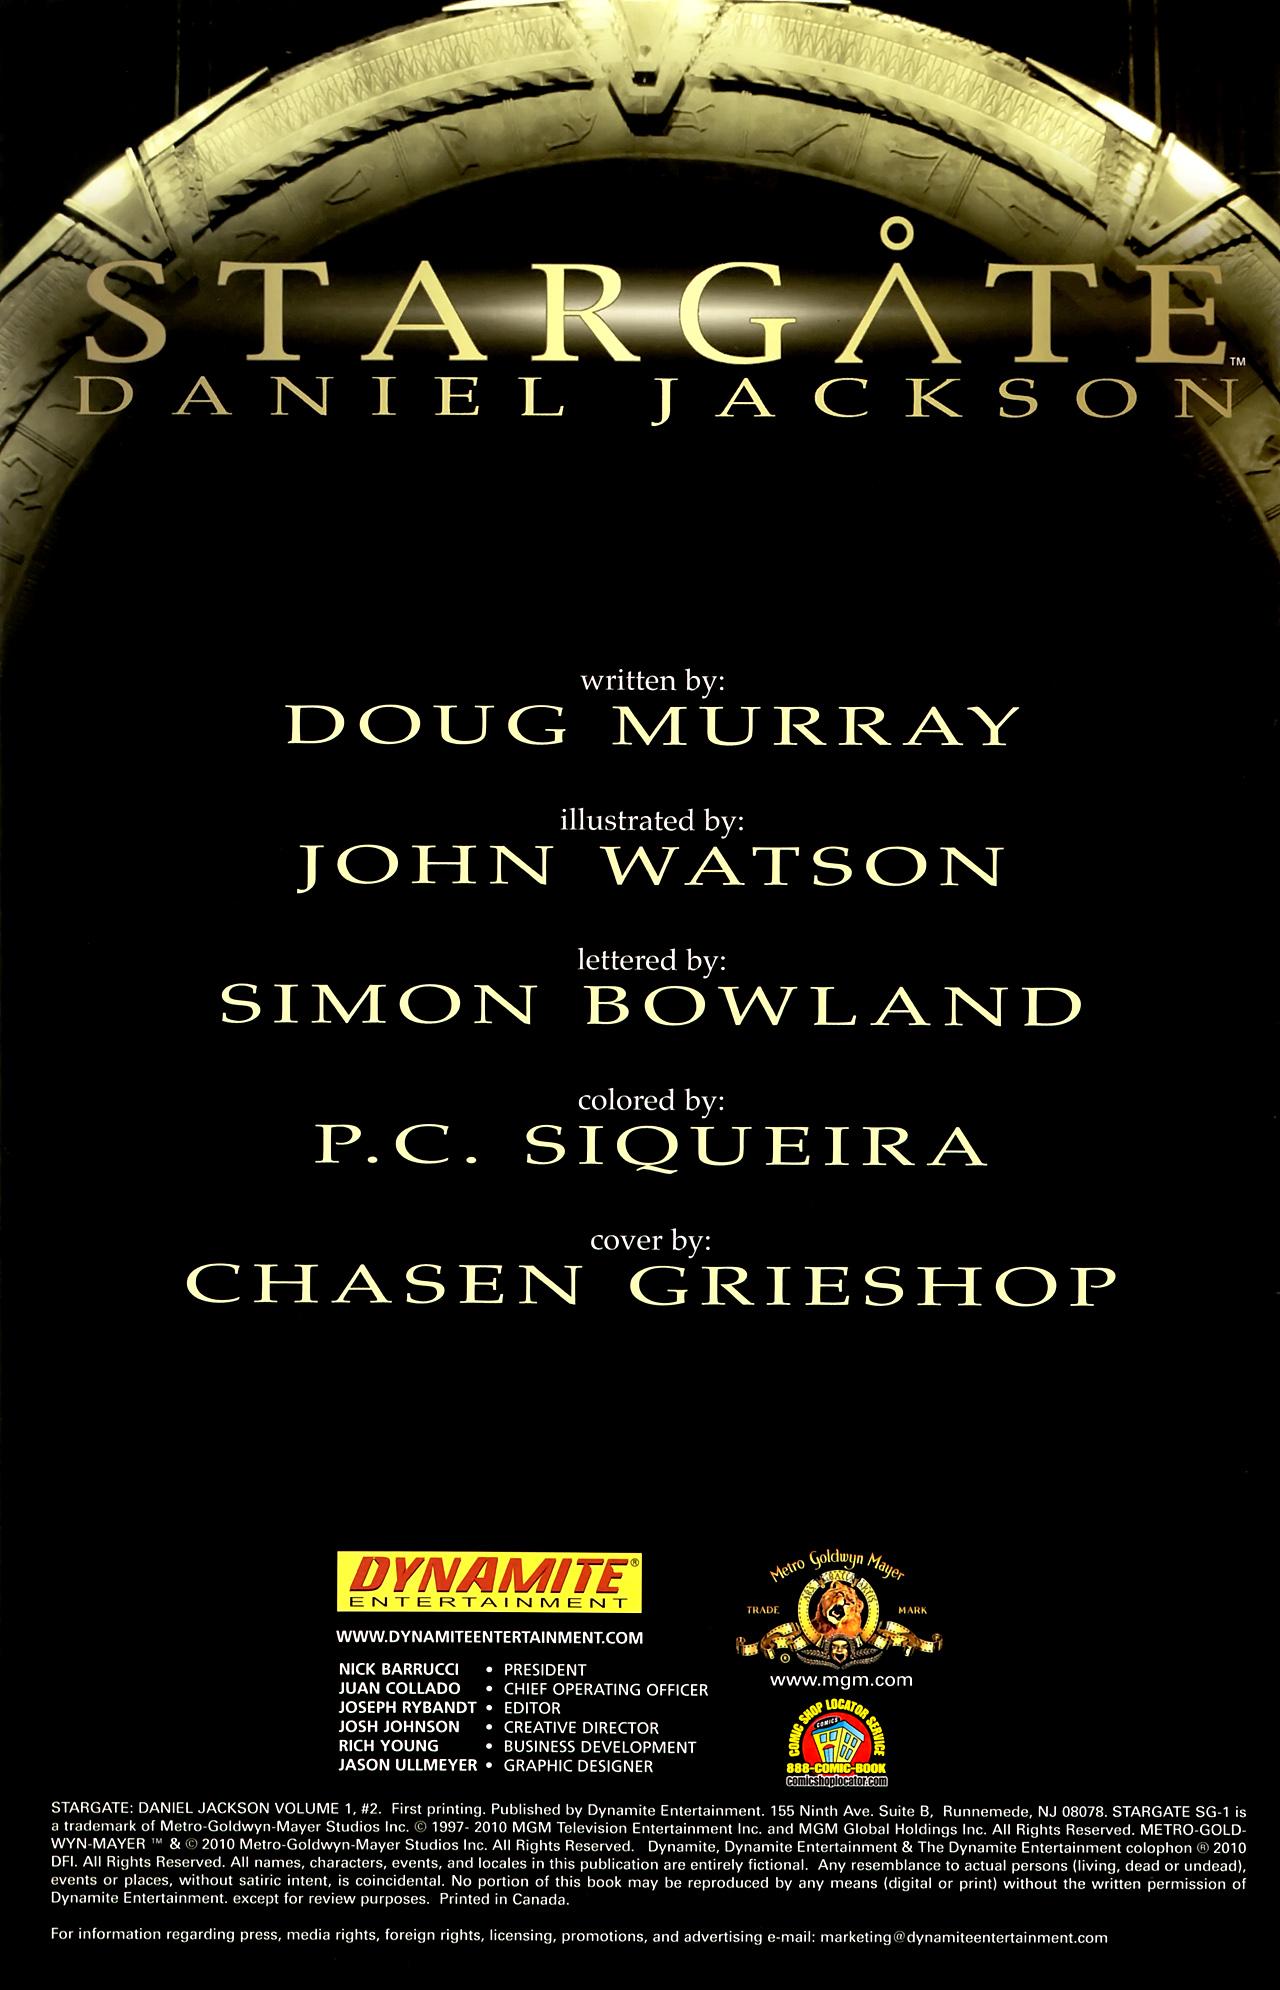 Read online Stargate: Daniel Jackson comic -  Issue #2 - 2